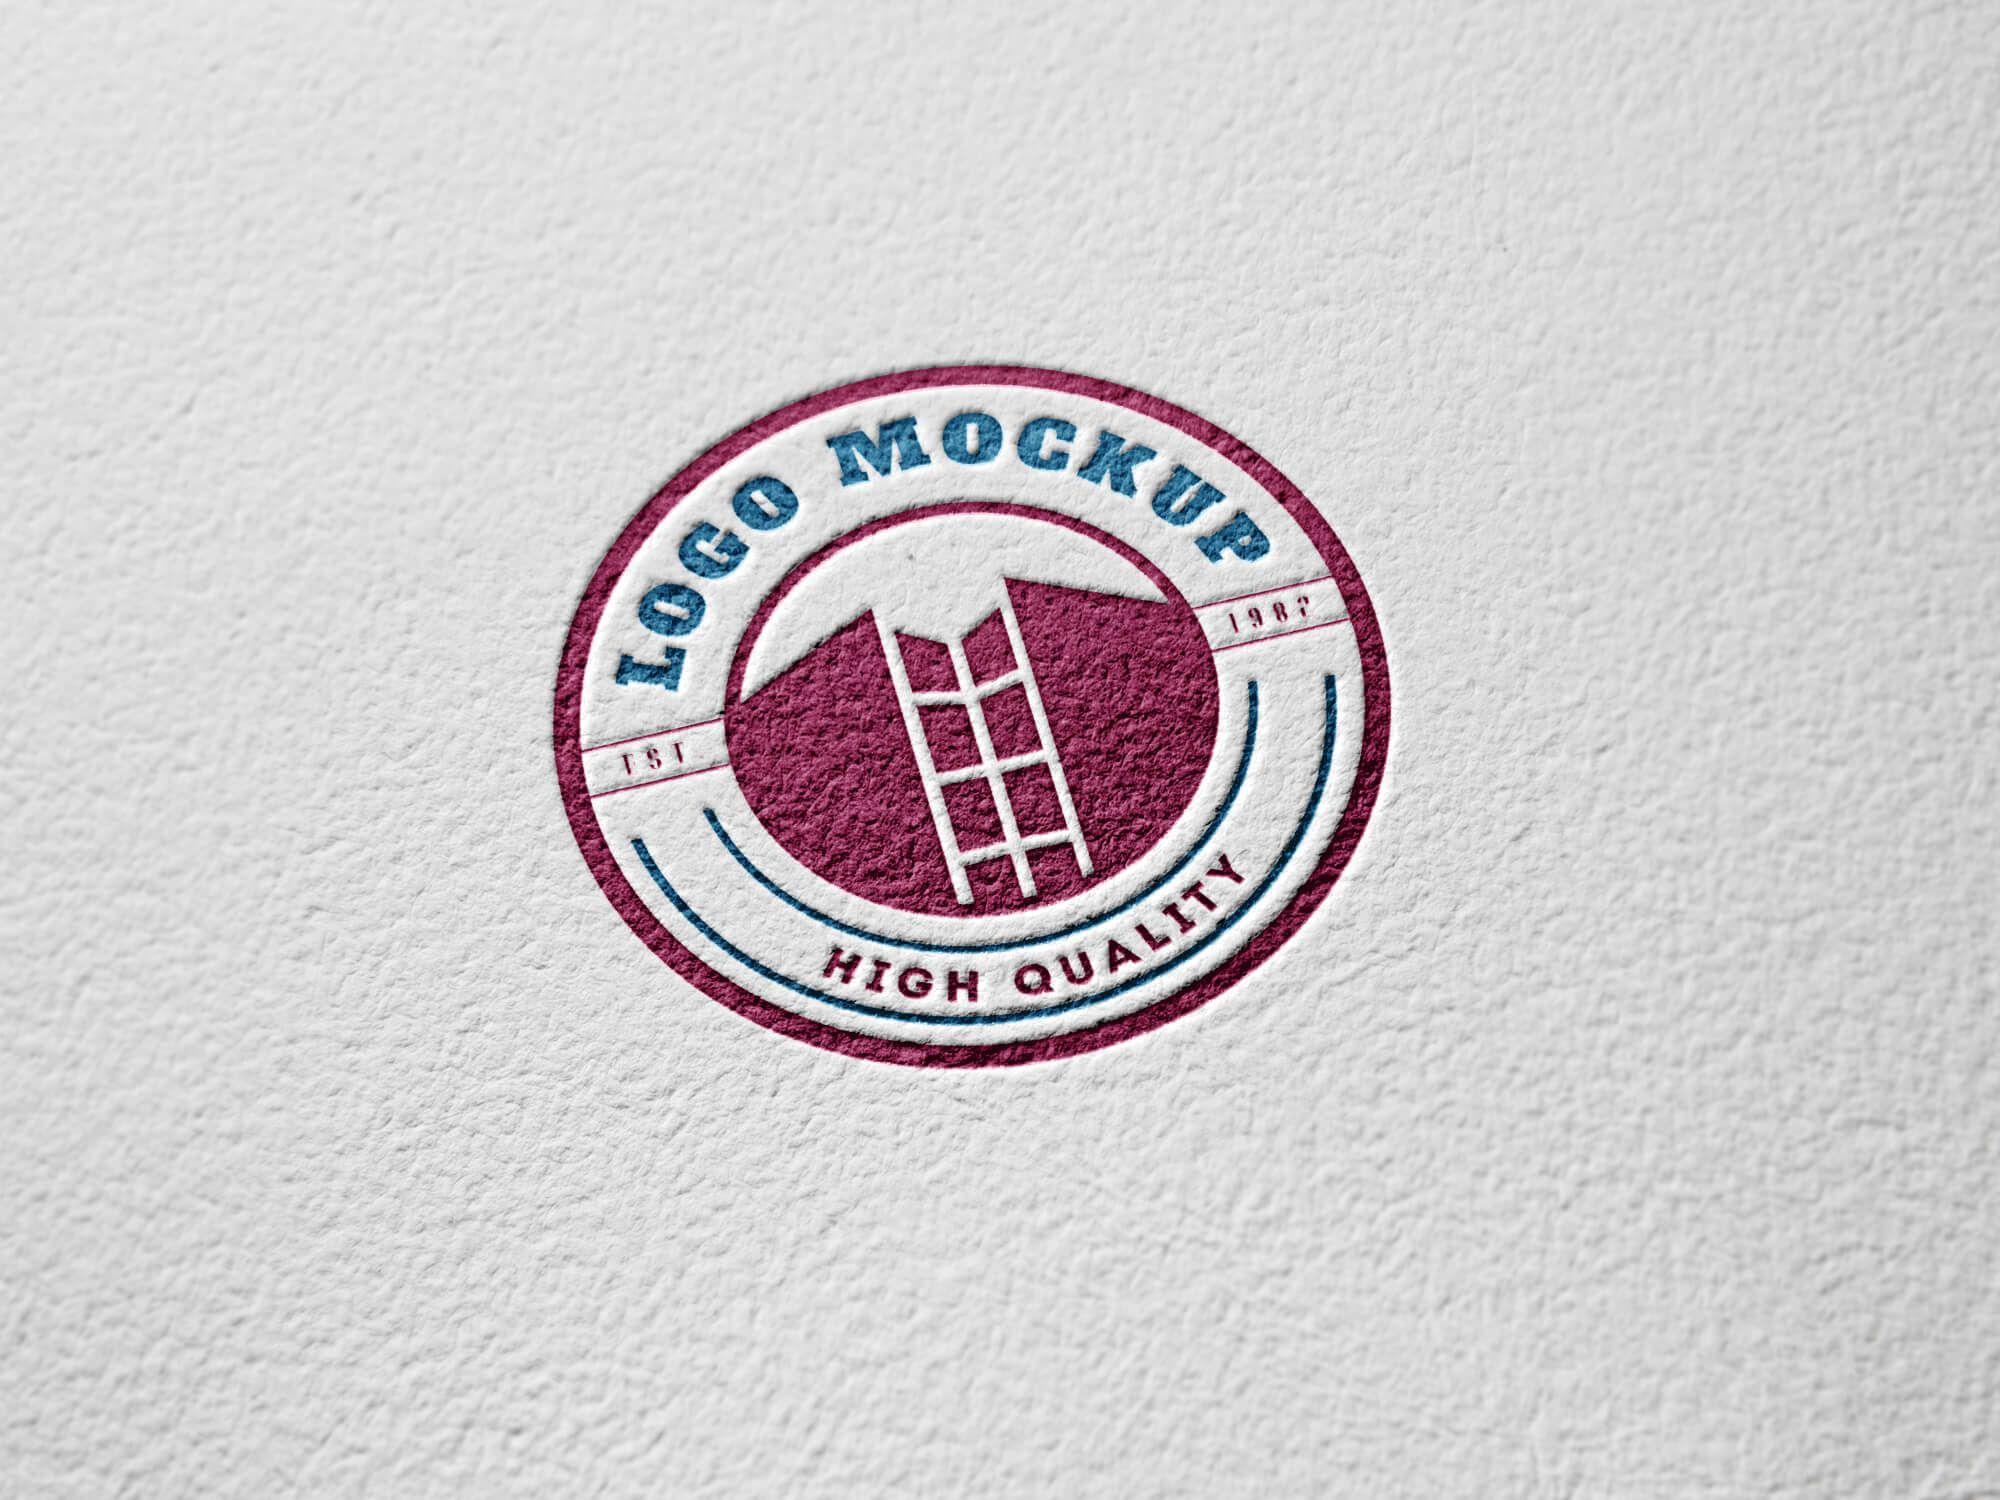 paper engraved logo mockup 20 1 mb psdsuckers com paper engraved logo mockup 20 1 mb psdsuckers com